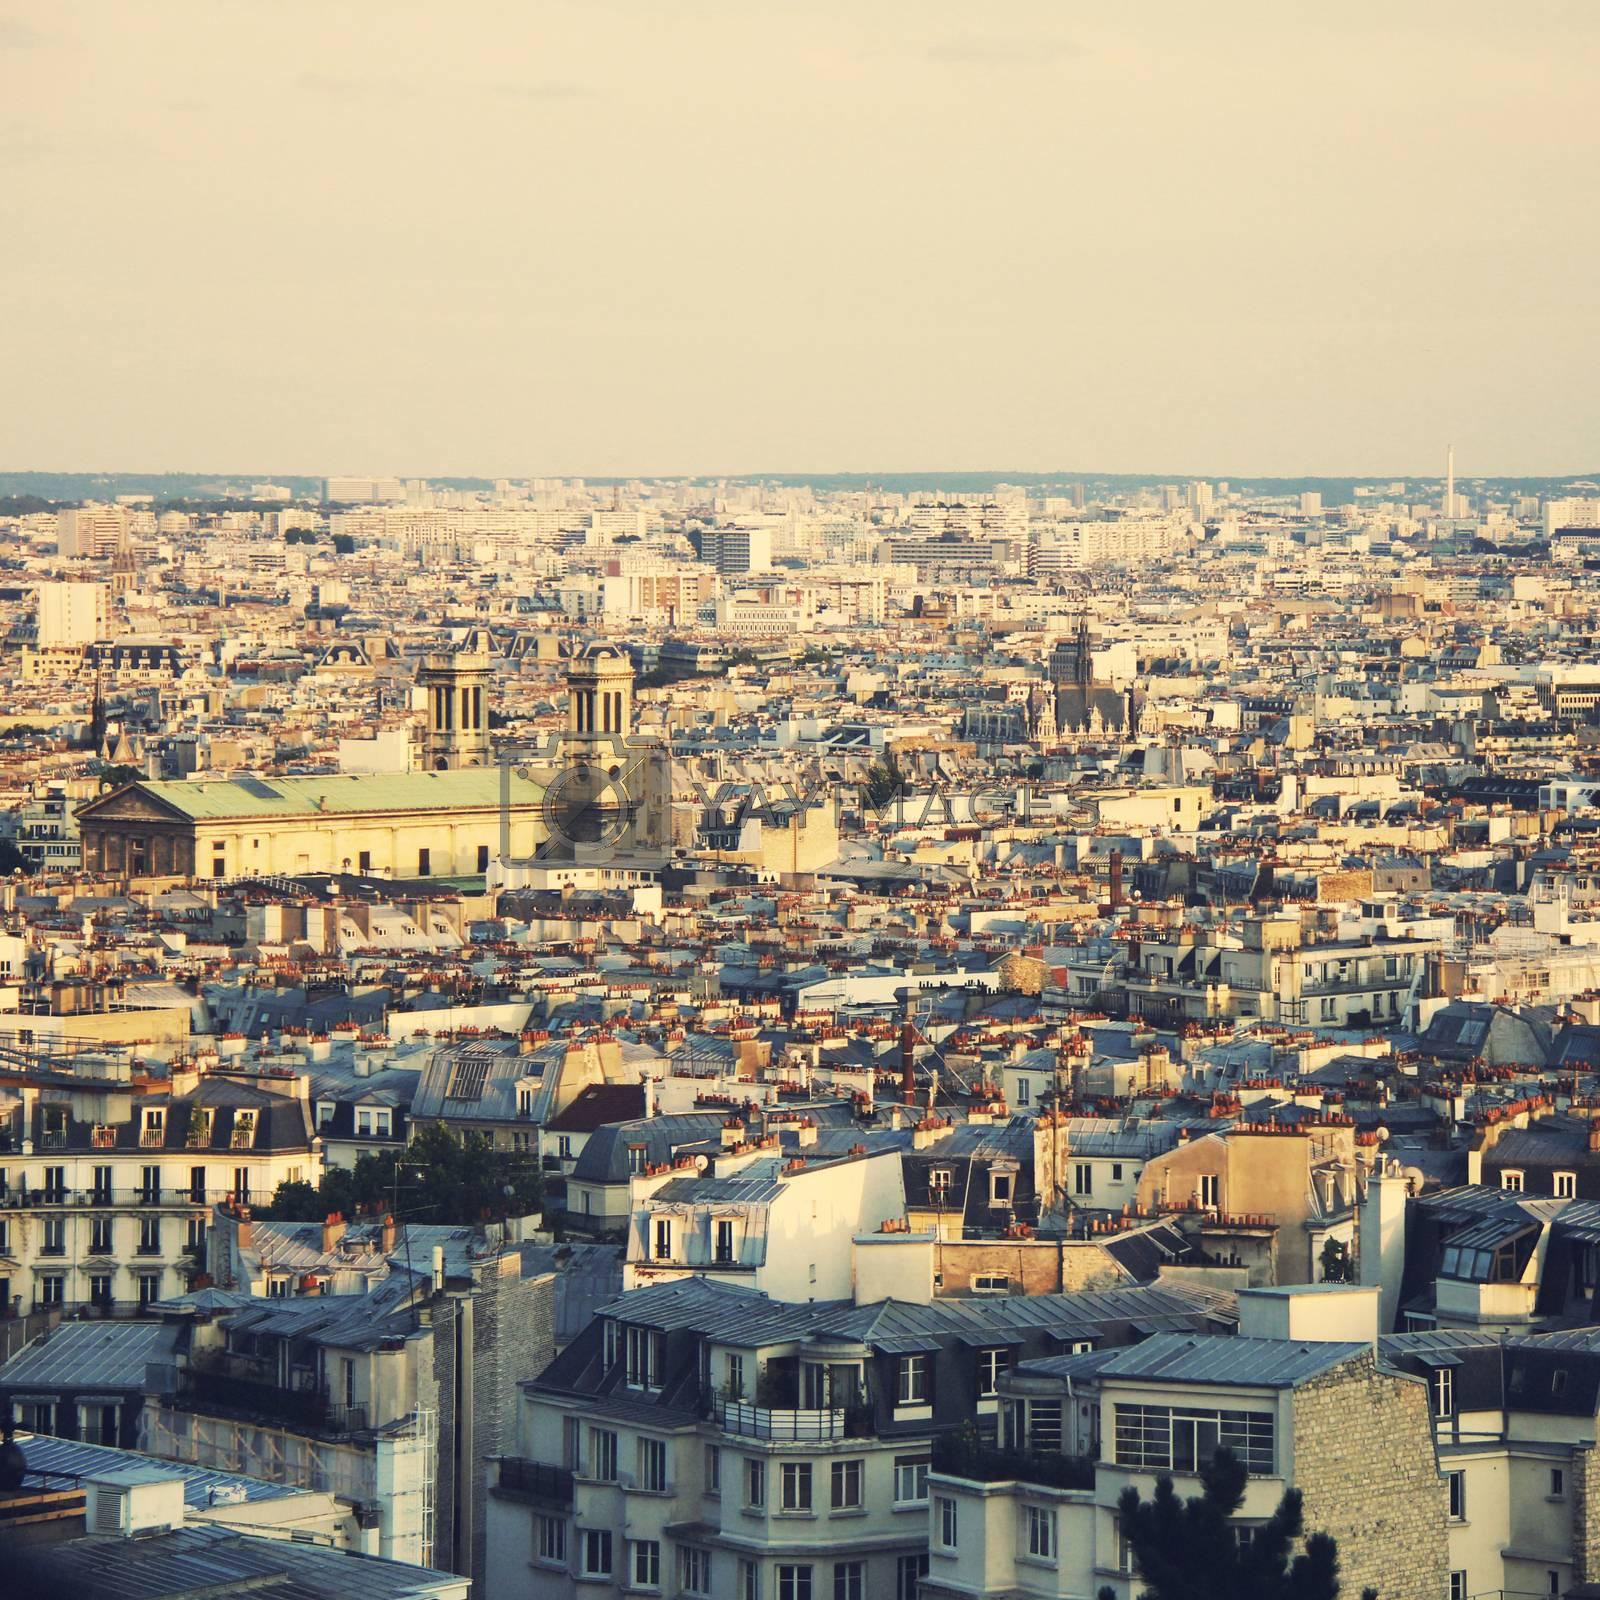 Top view of paris skyline, retro filter effect